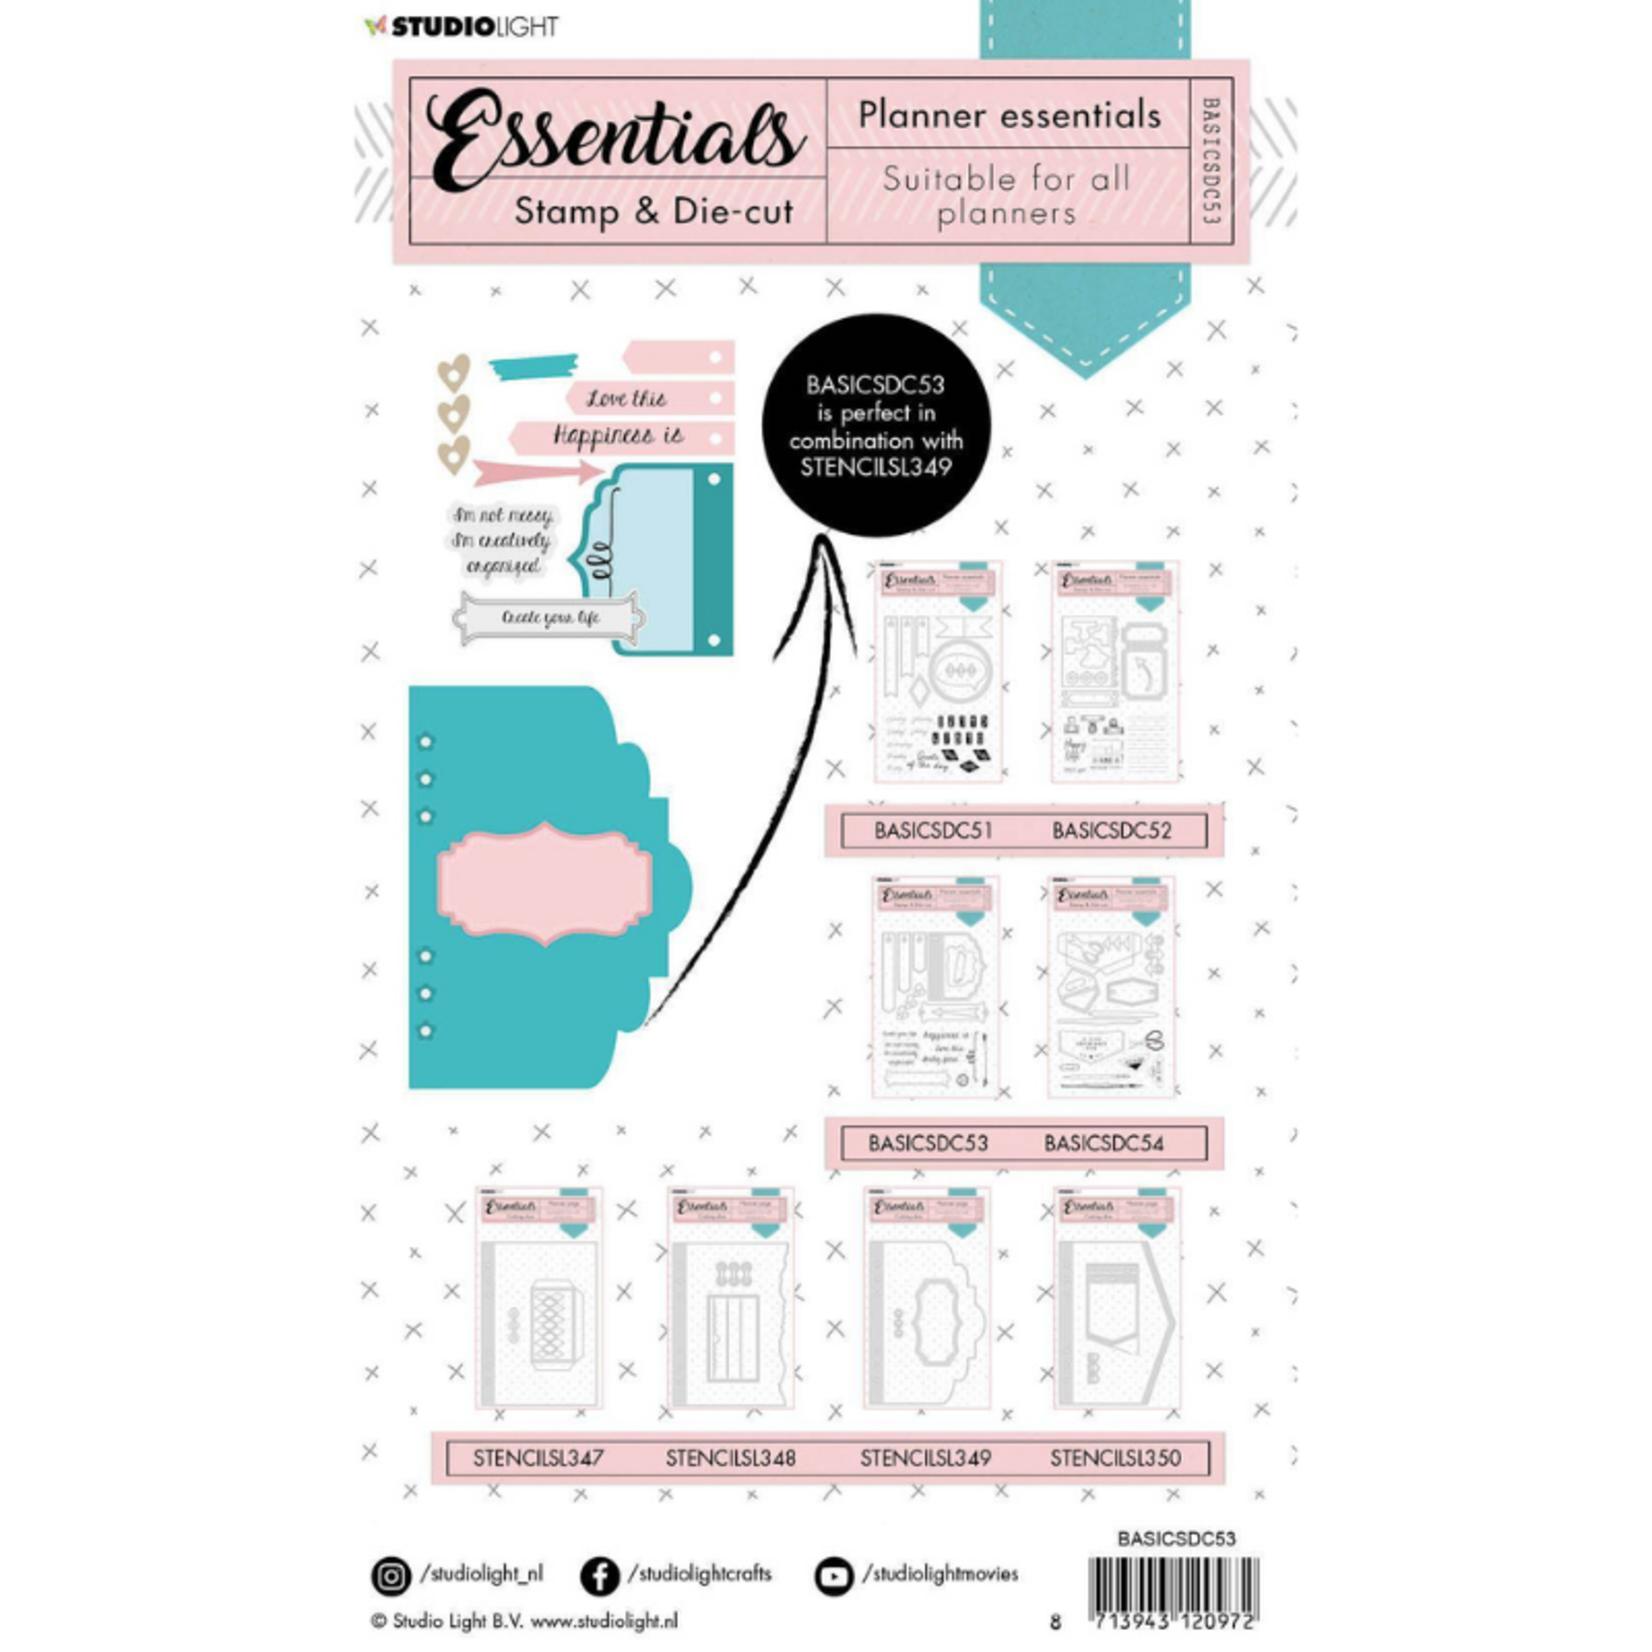 Studio Light Studio Light - Stamp & Die-cut Rectangle Planner Essentials nr.53